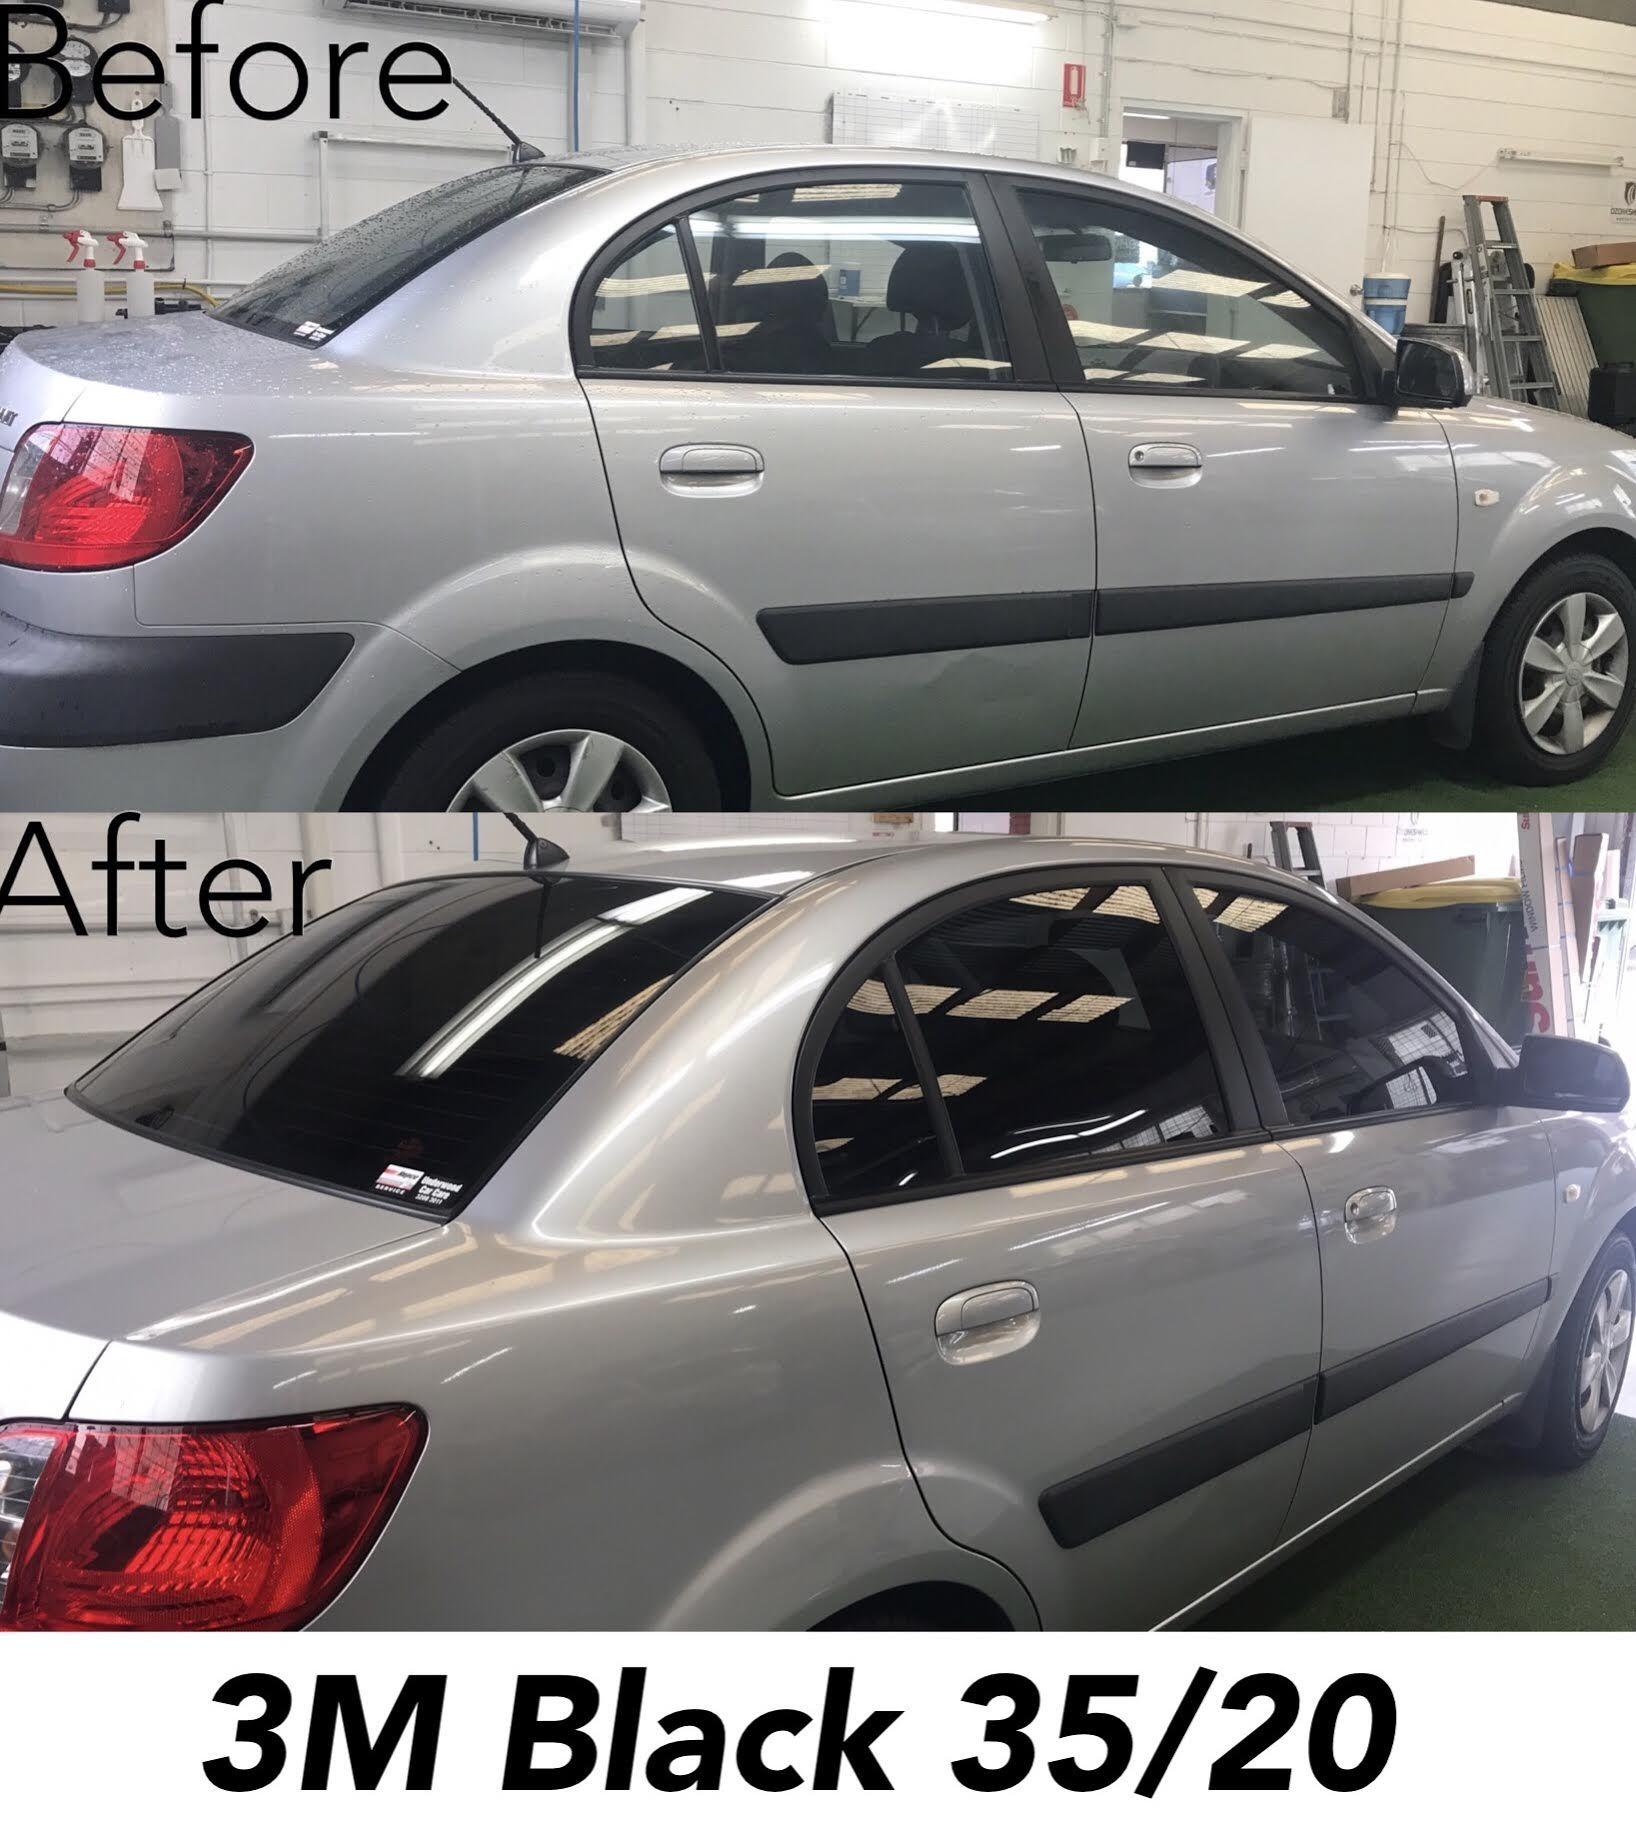 3m Black Window Tint 35 20 On Kia Rio Before And After Photos Tinted Windows Car Tinted Windows Window Glass Tinting